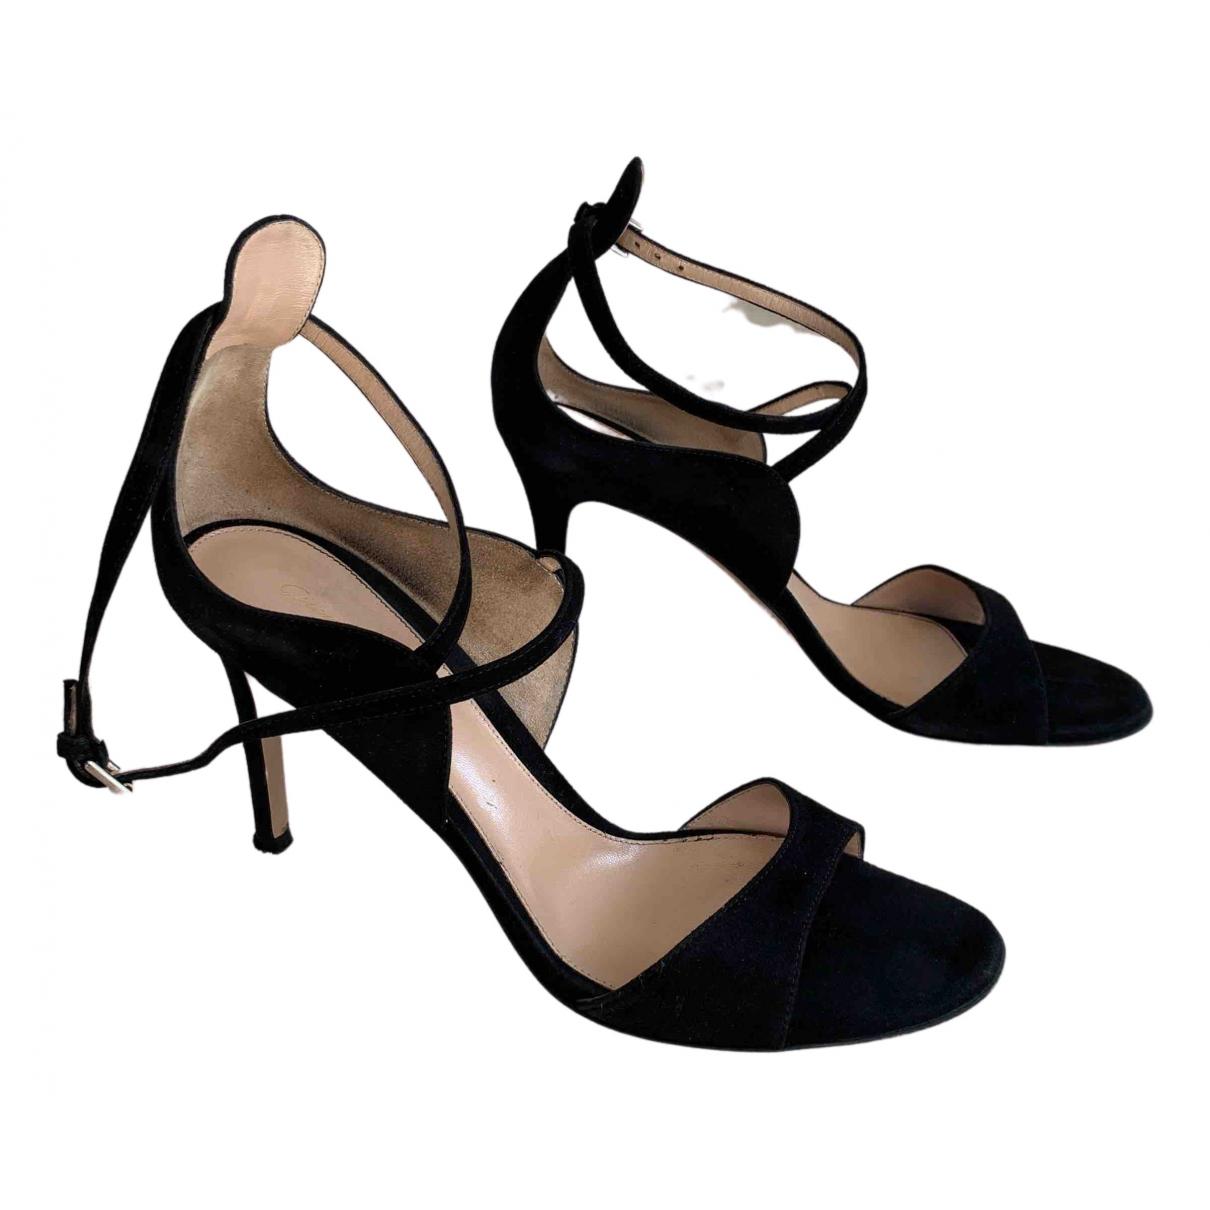 Gianvito Rossi \N Black Suede Sandals for Women 39 EU